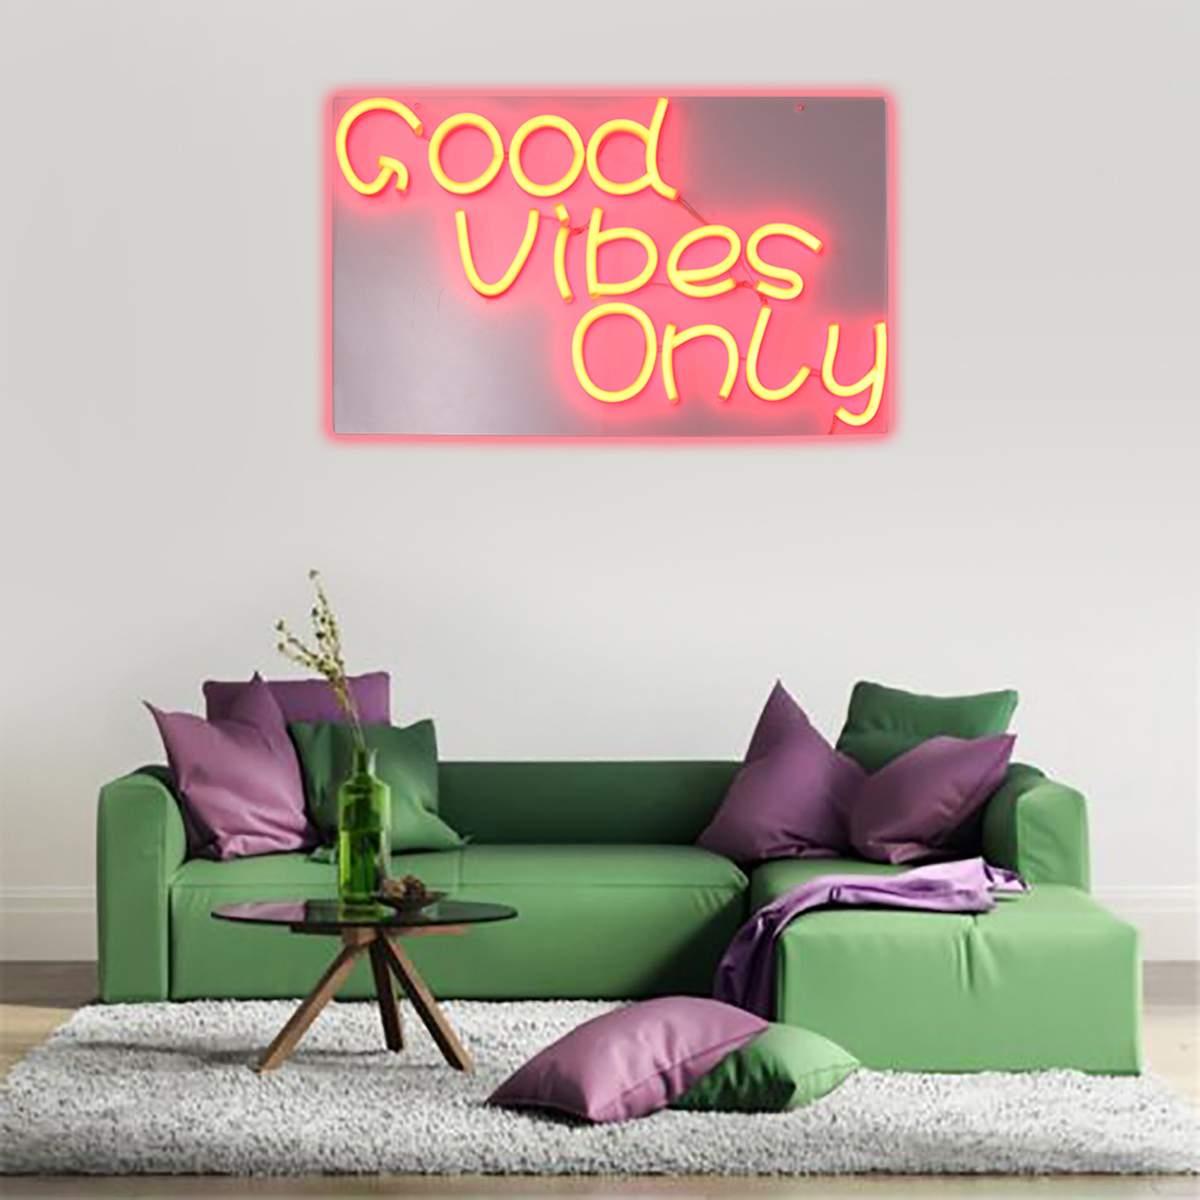 Good Vibes Only Neon Art Sign LED Light Tube Handmade Visual Artwork Wall Decoration Colorful Neon Bulbs Billboard 60cmX35cm